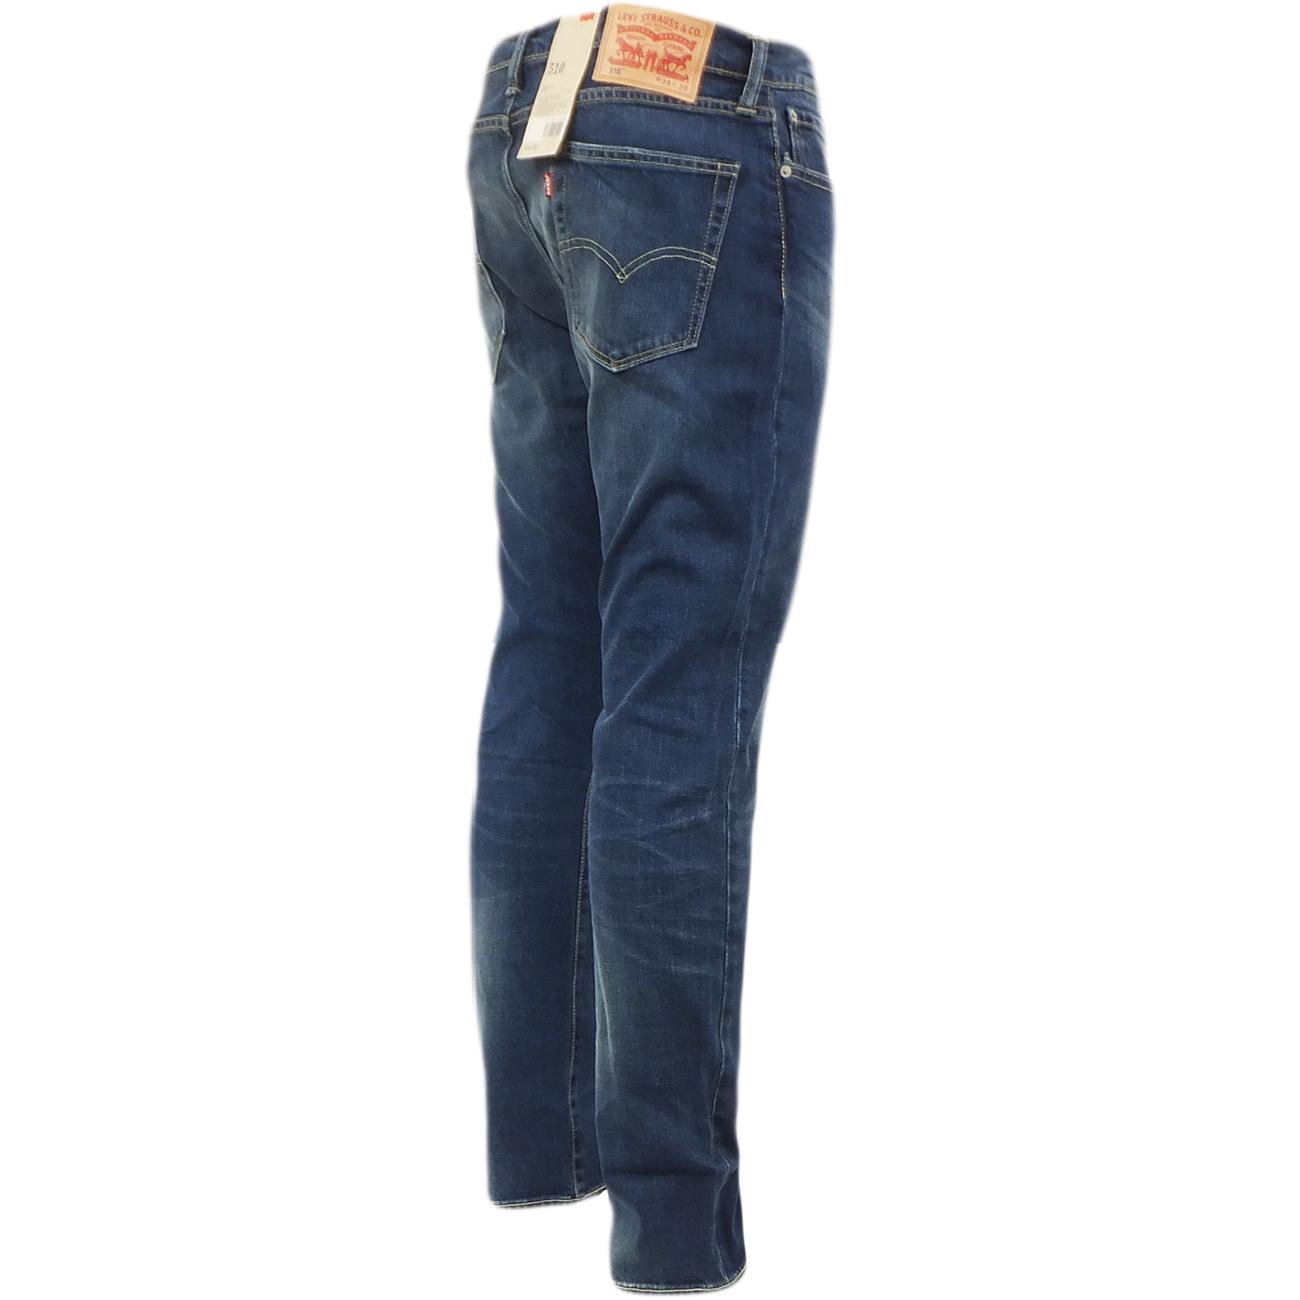 Brand new Levi Strauss 510 Skinny Jean - Skinny Leg Denim Trouser Pant New  HZ98